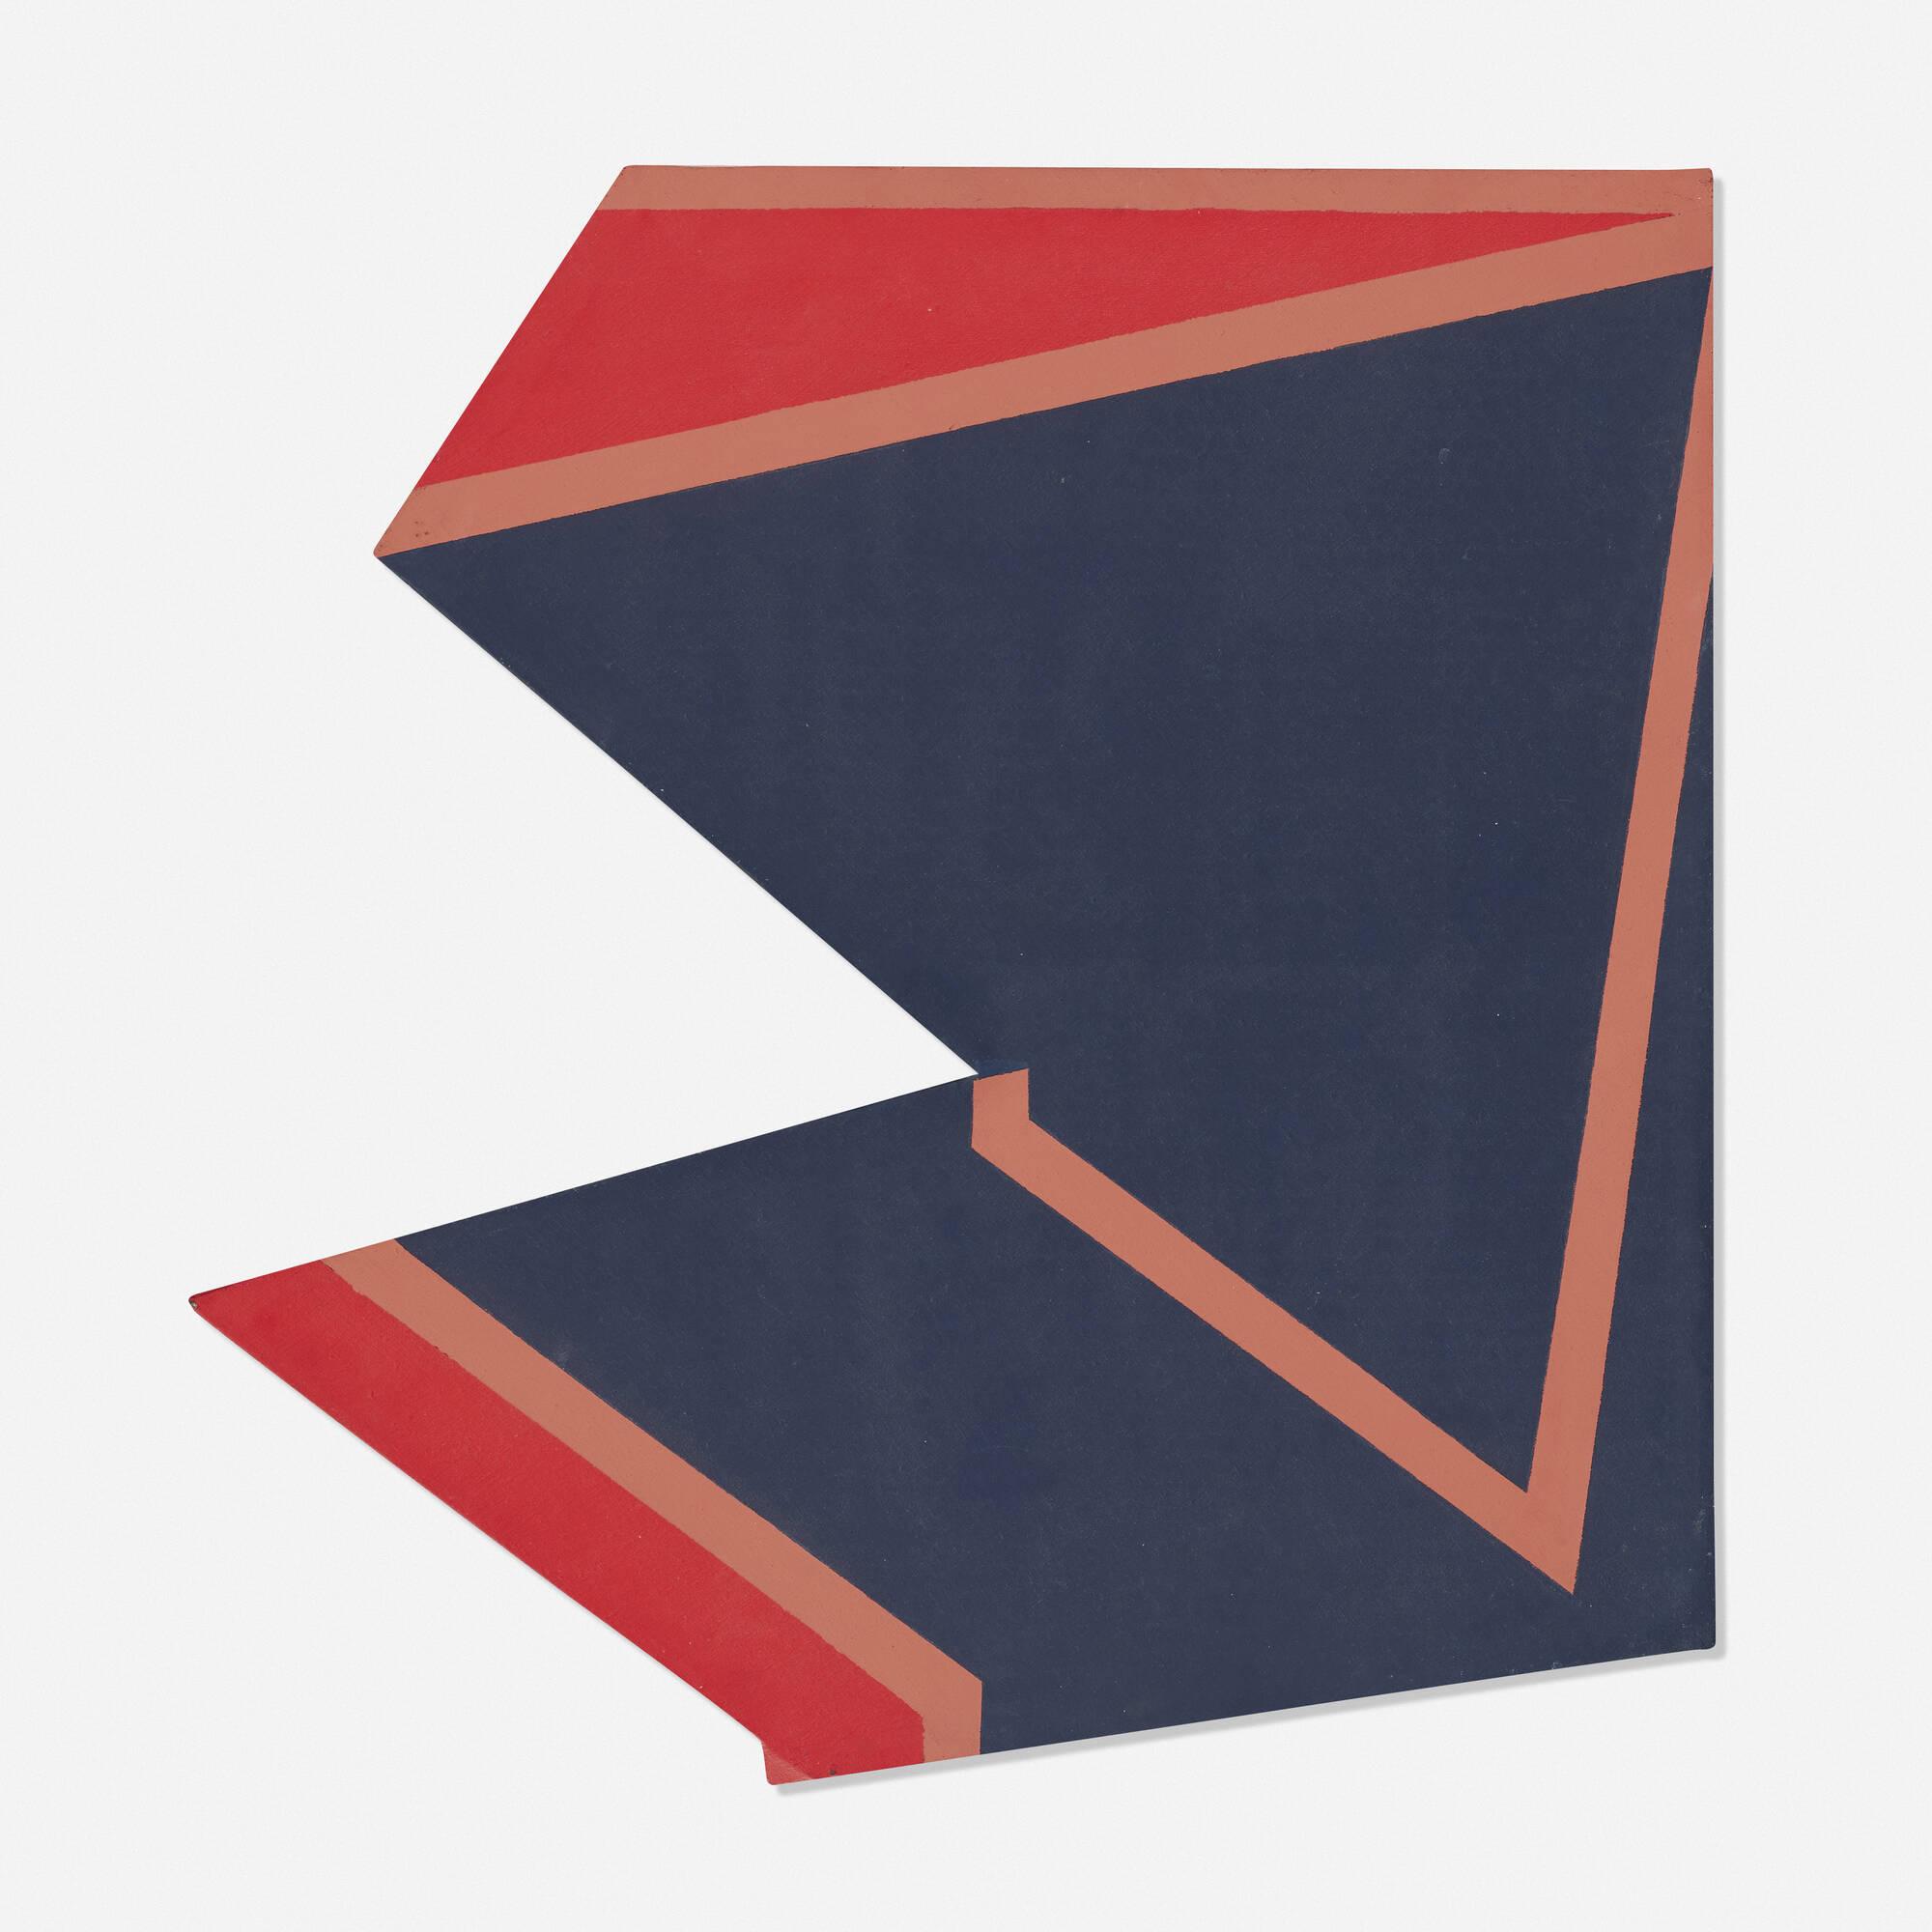 177: Jake Berthot / Untitled (Irregular Geometry) (1 of 1)